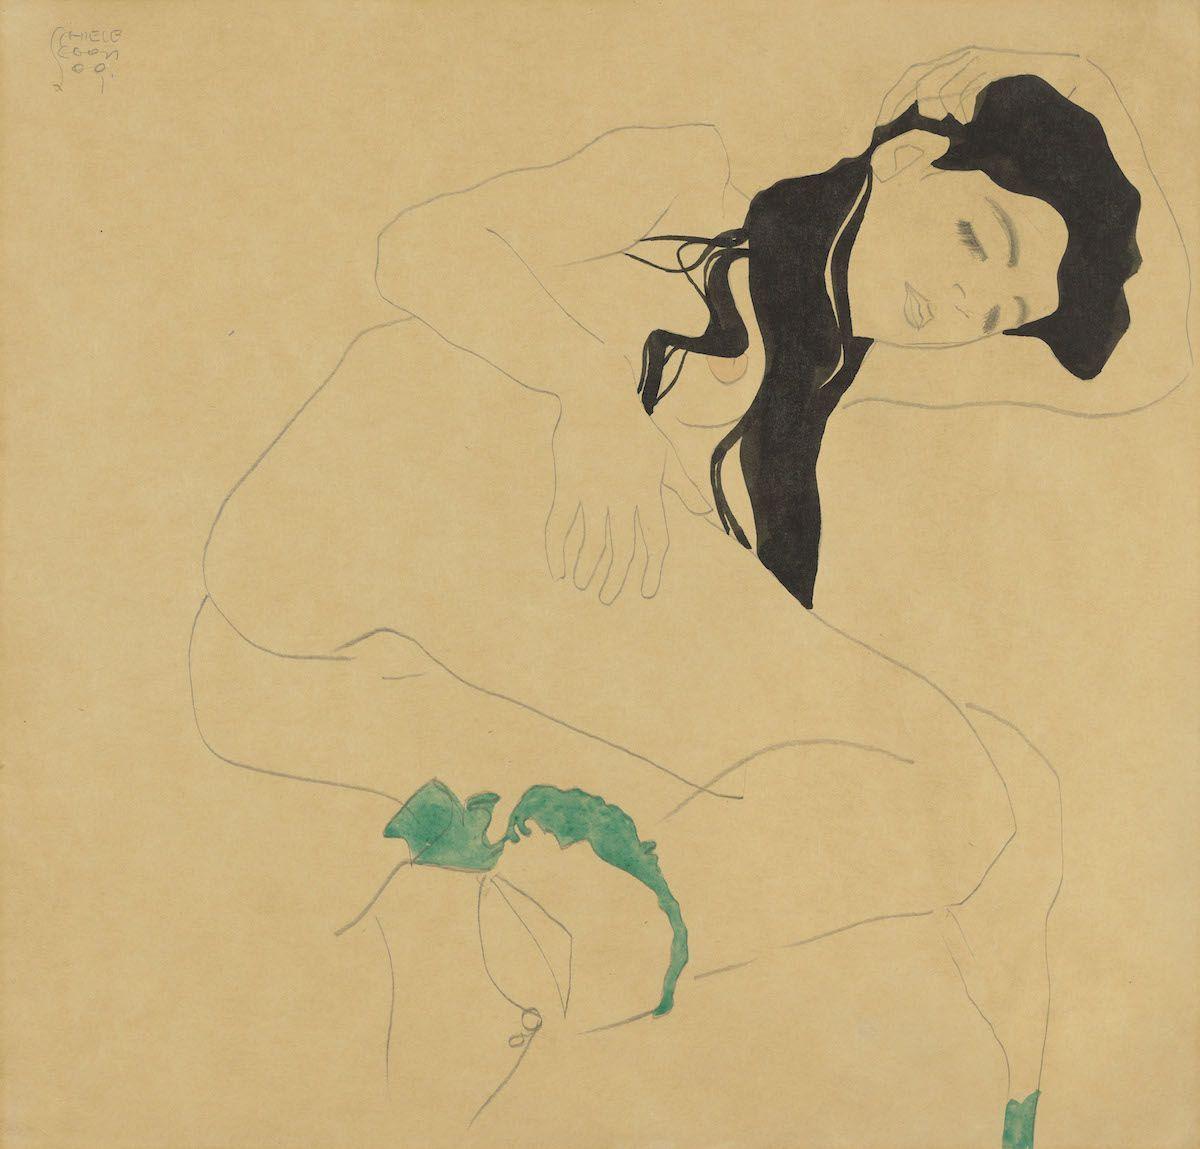 Egon Schiele, Liegender Mädchenakt, 1909. Est. £200,000–300,000, sold for £1,271,250. Courtesy Christie's Images Ltd. 2019.